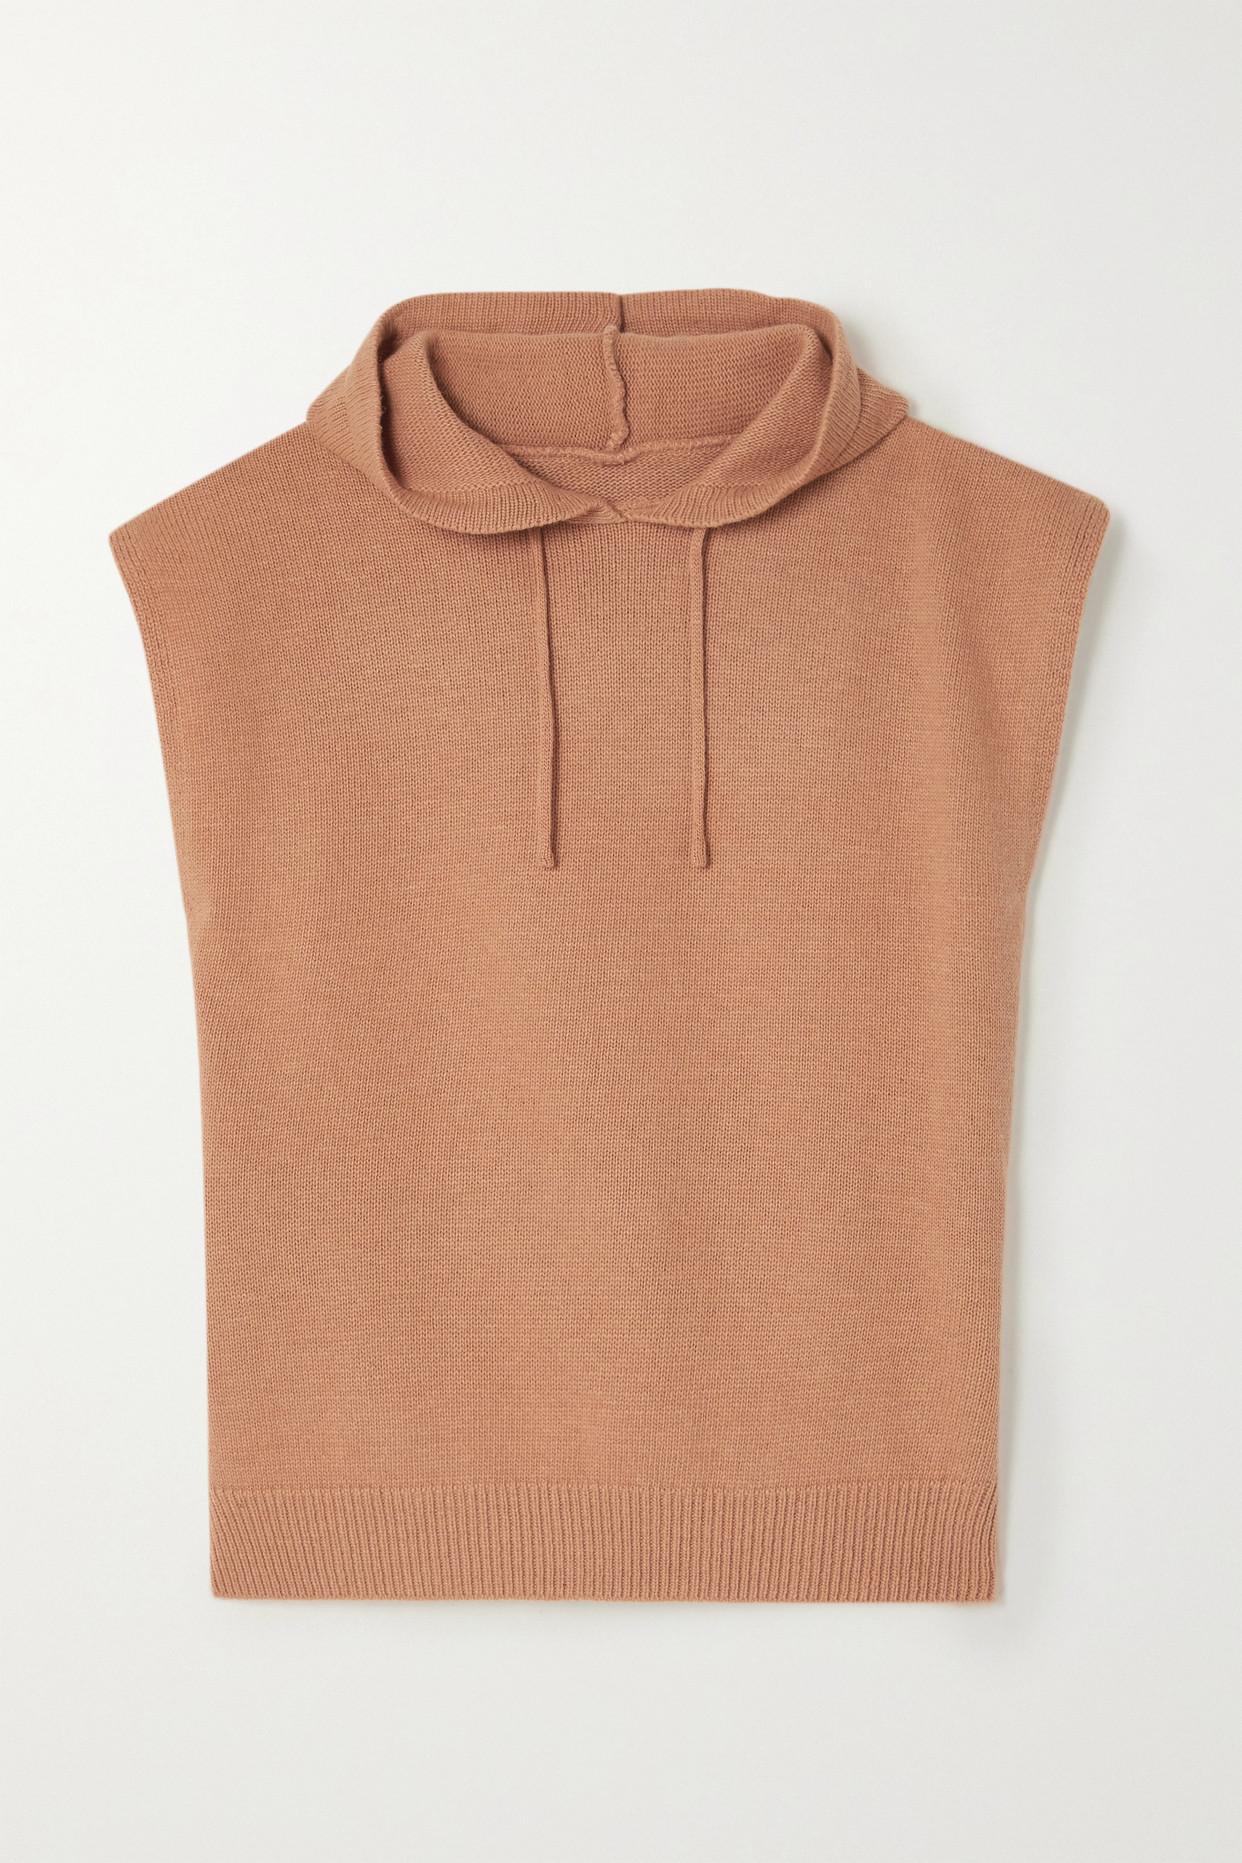 FRANKIE SHOP - Juno 羊毛混纺帽衫 - 棕色 - M/L